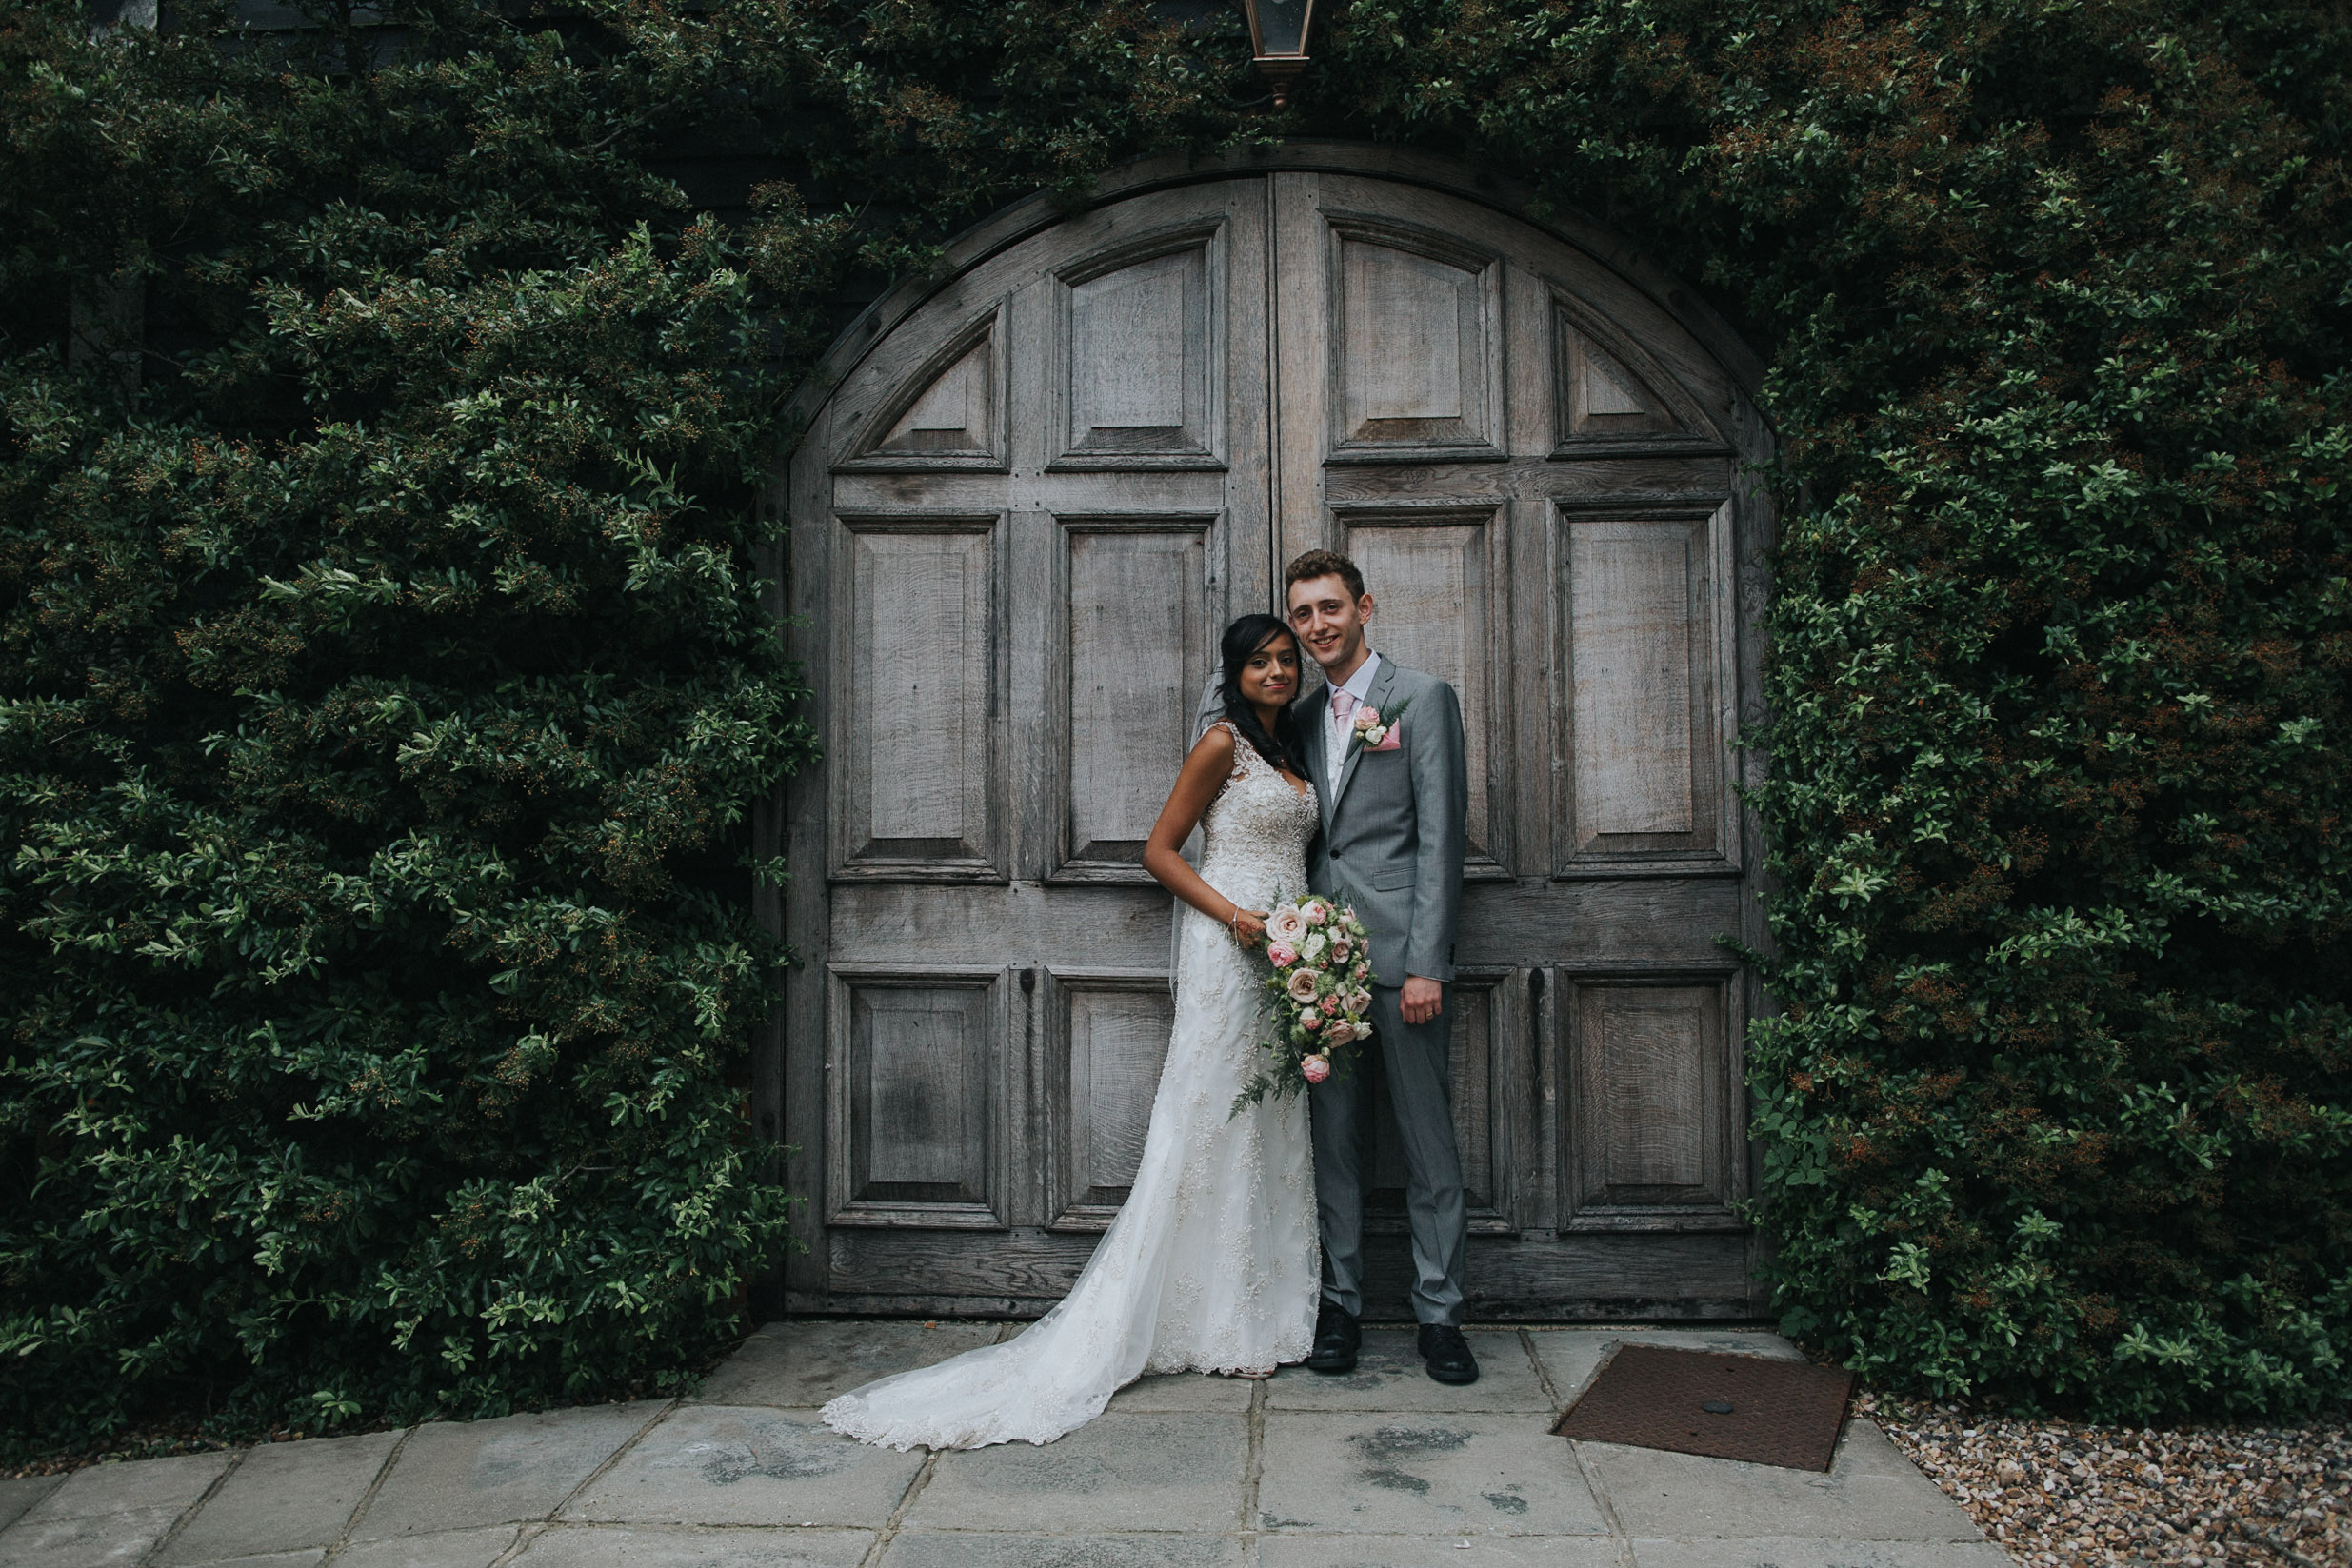 WeddingPhotographerEastSussex